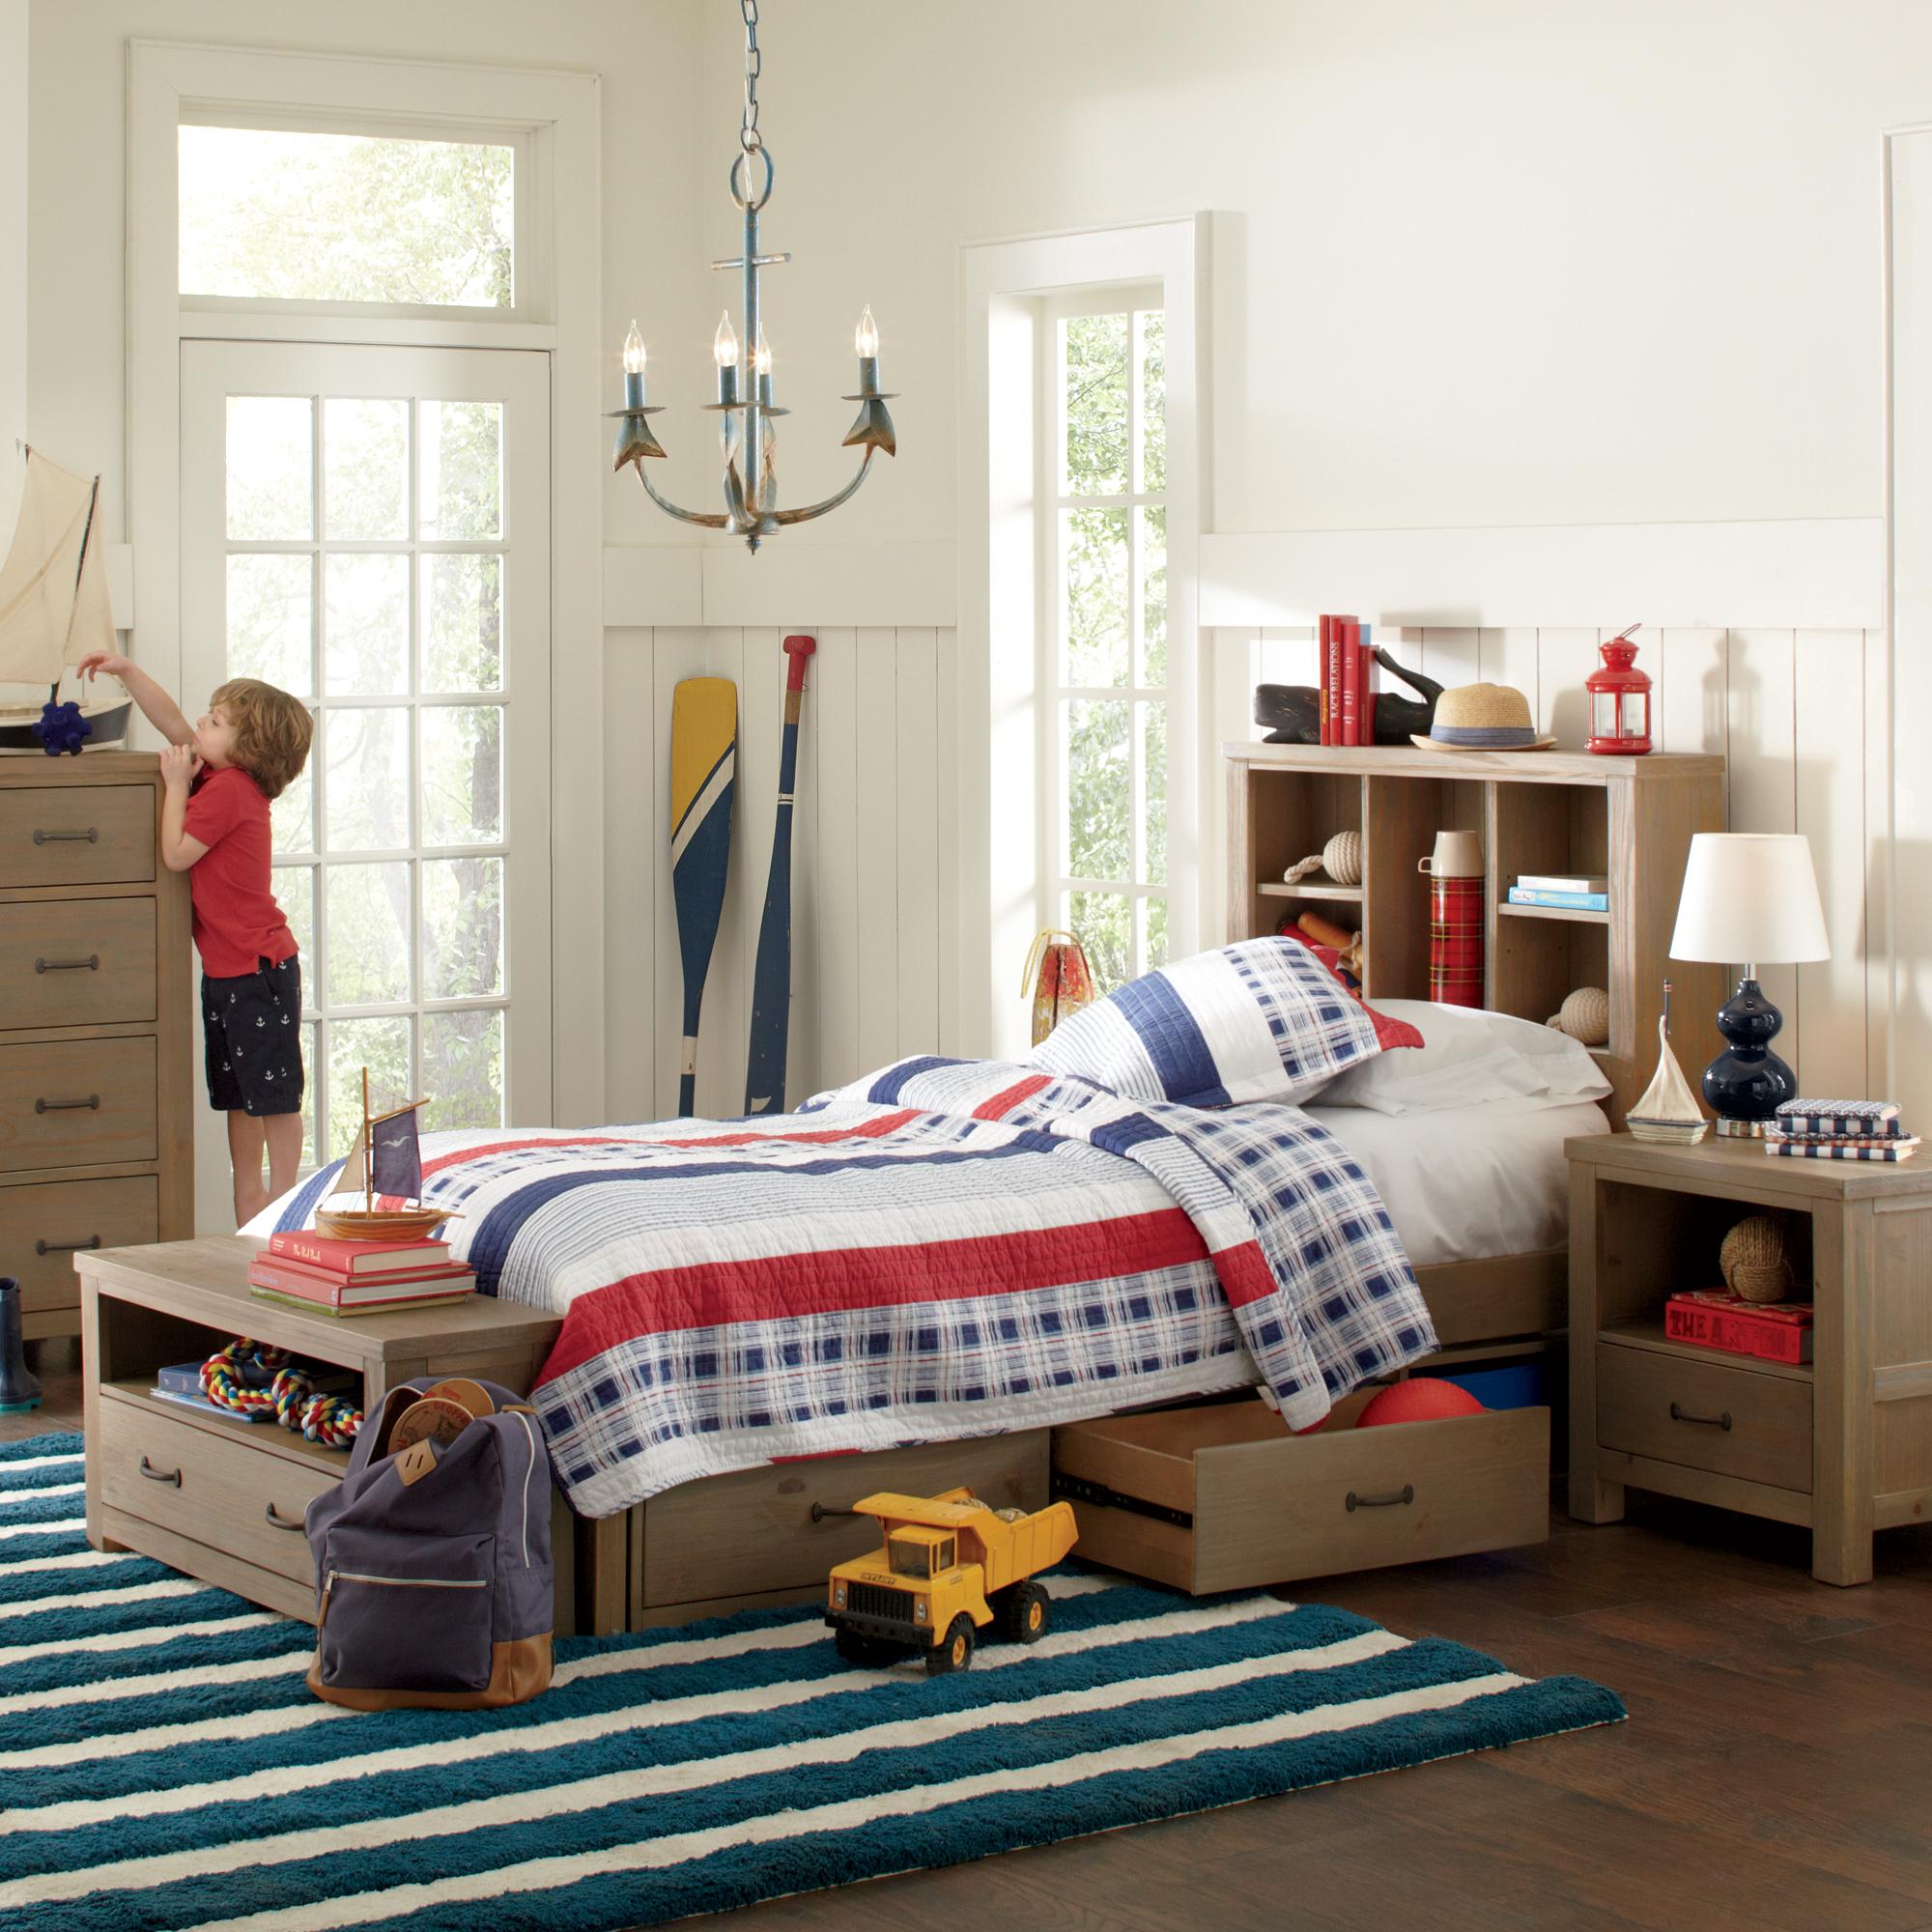 Farmhouse & Rustic Kids Bedroom Furniture | Birch Lane